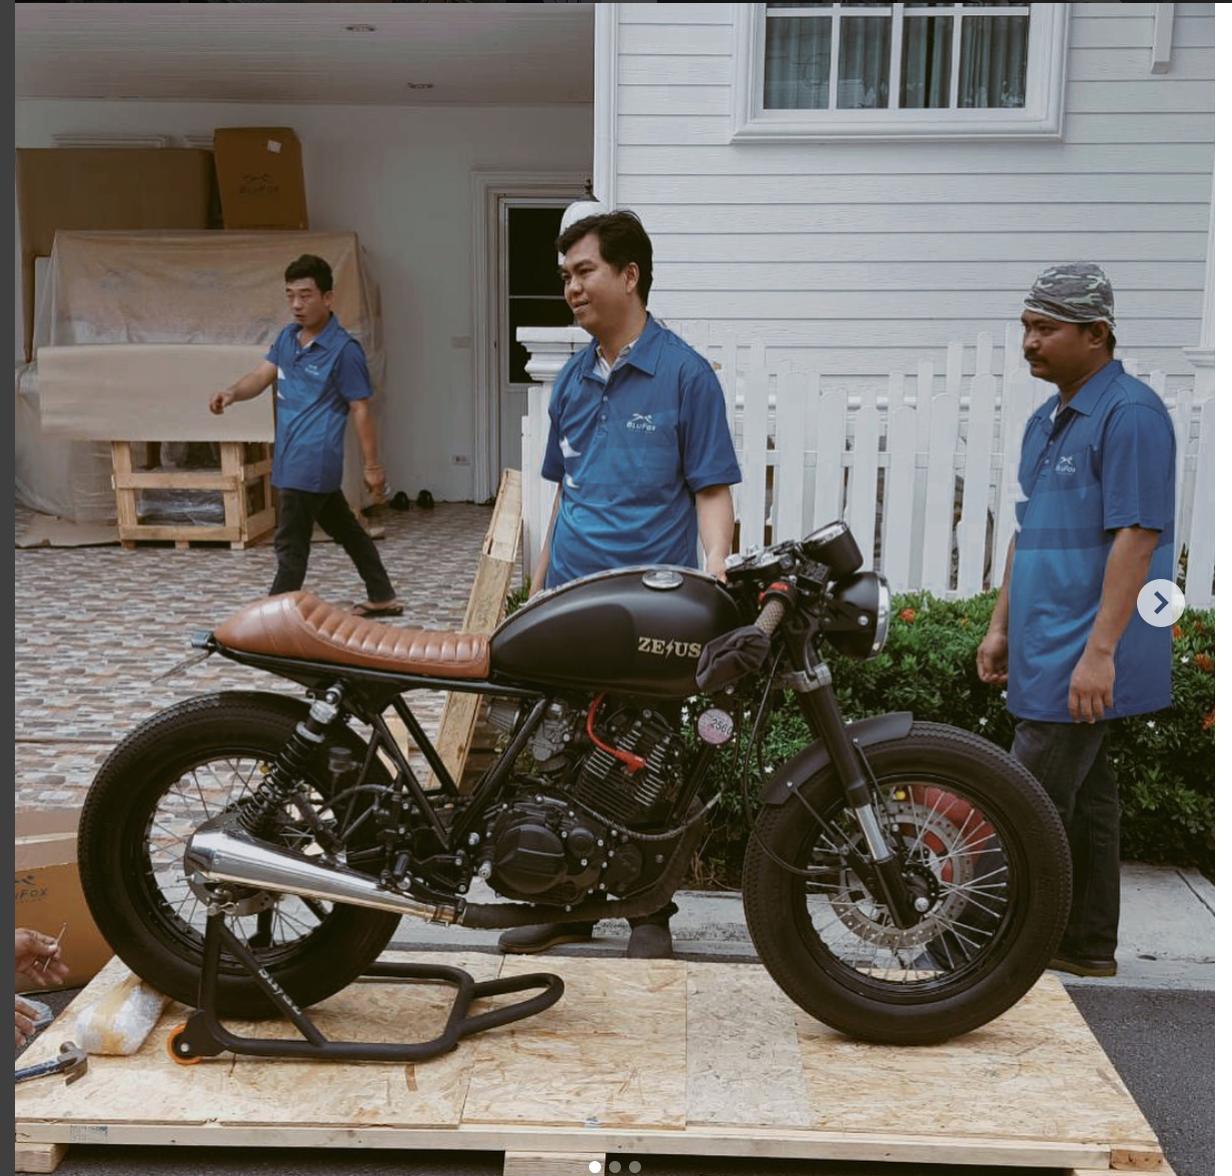 Cafe Racer Bangkok Bikes For Sale In Thailand Visa Suzuki Gn250 Kit Stallion 250